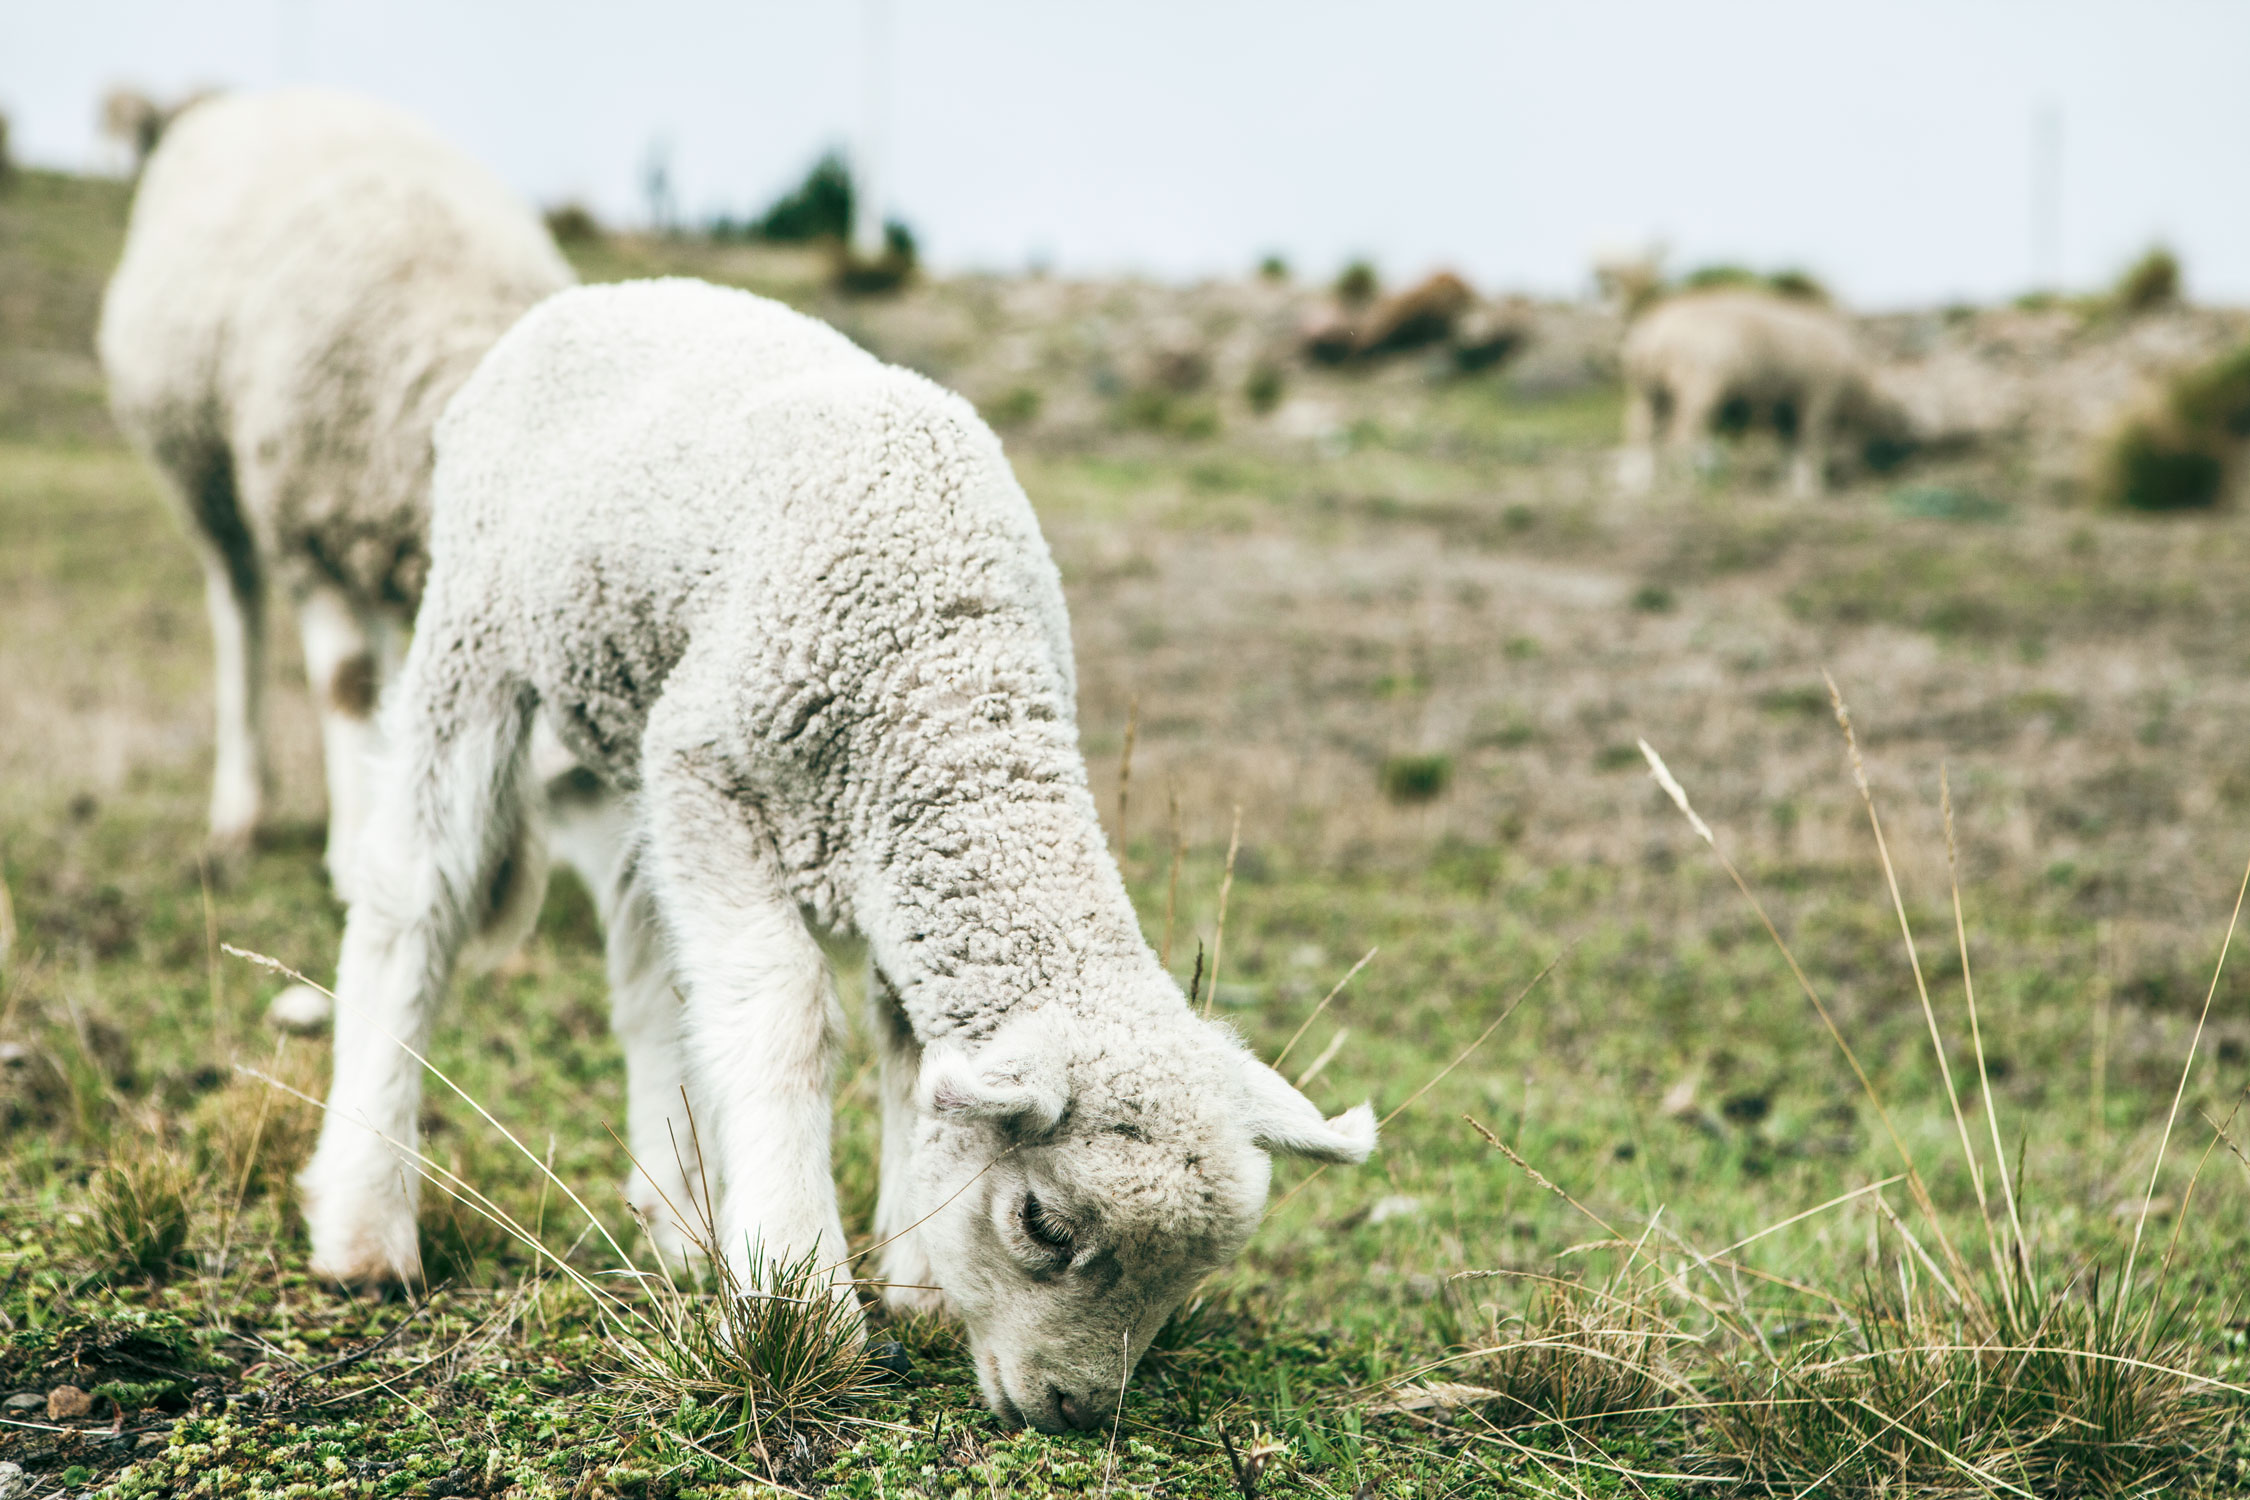 quilotoa-loop-lago-de-wander-south-sheep-lamb-1.jpg